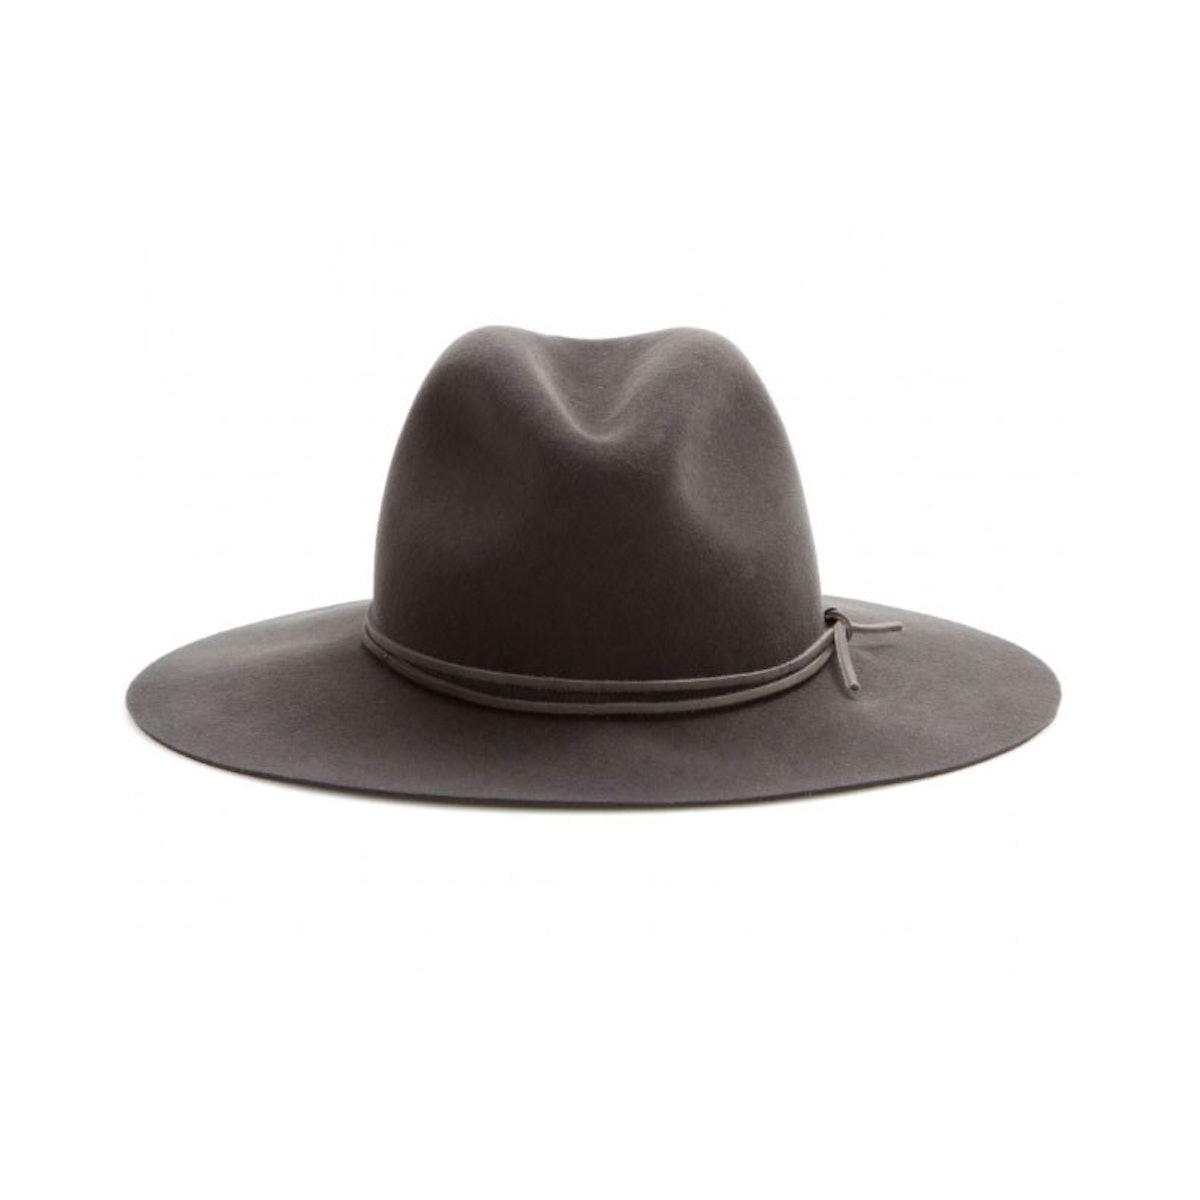 Rag and bone hat